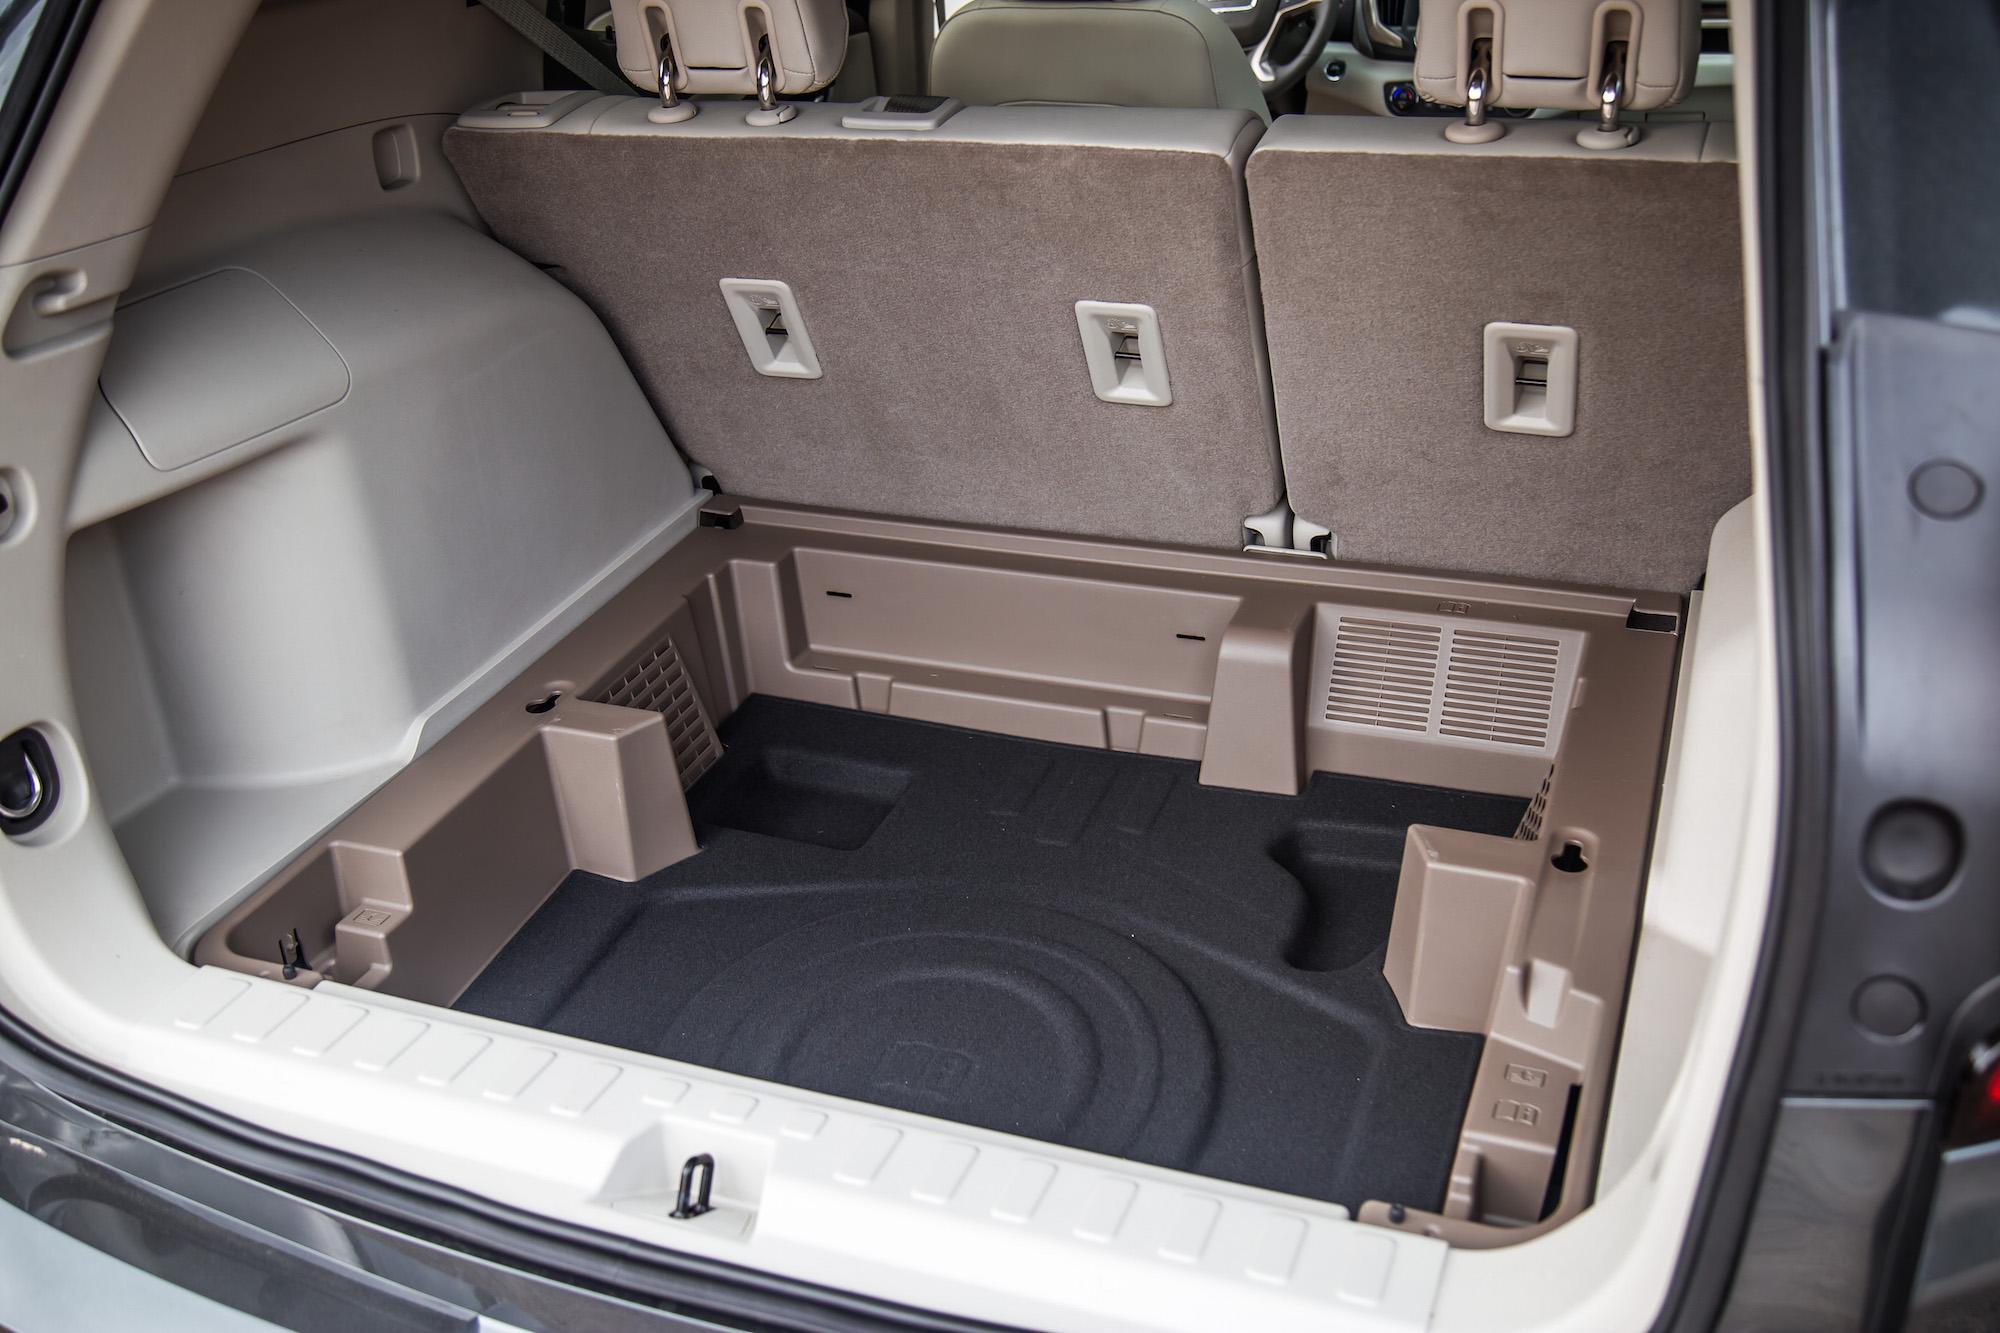 2018 Toyota Rav4 Hybrid >> First Drive: 2018 GMC Terrain | Canadian Auto Review